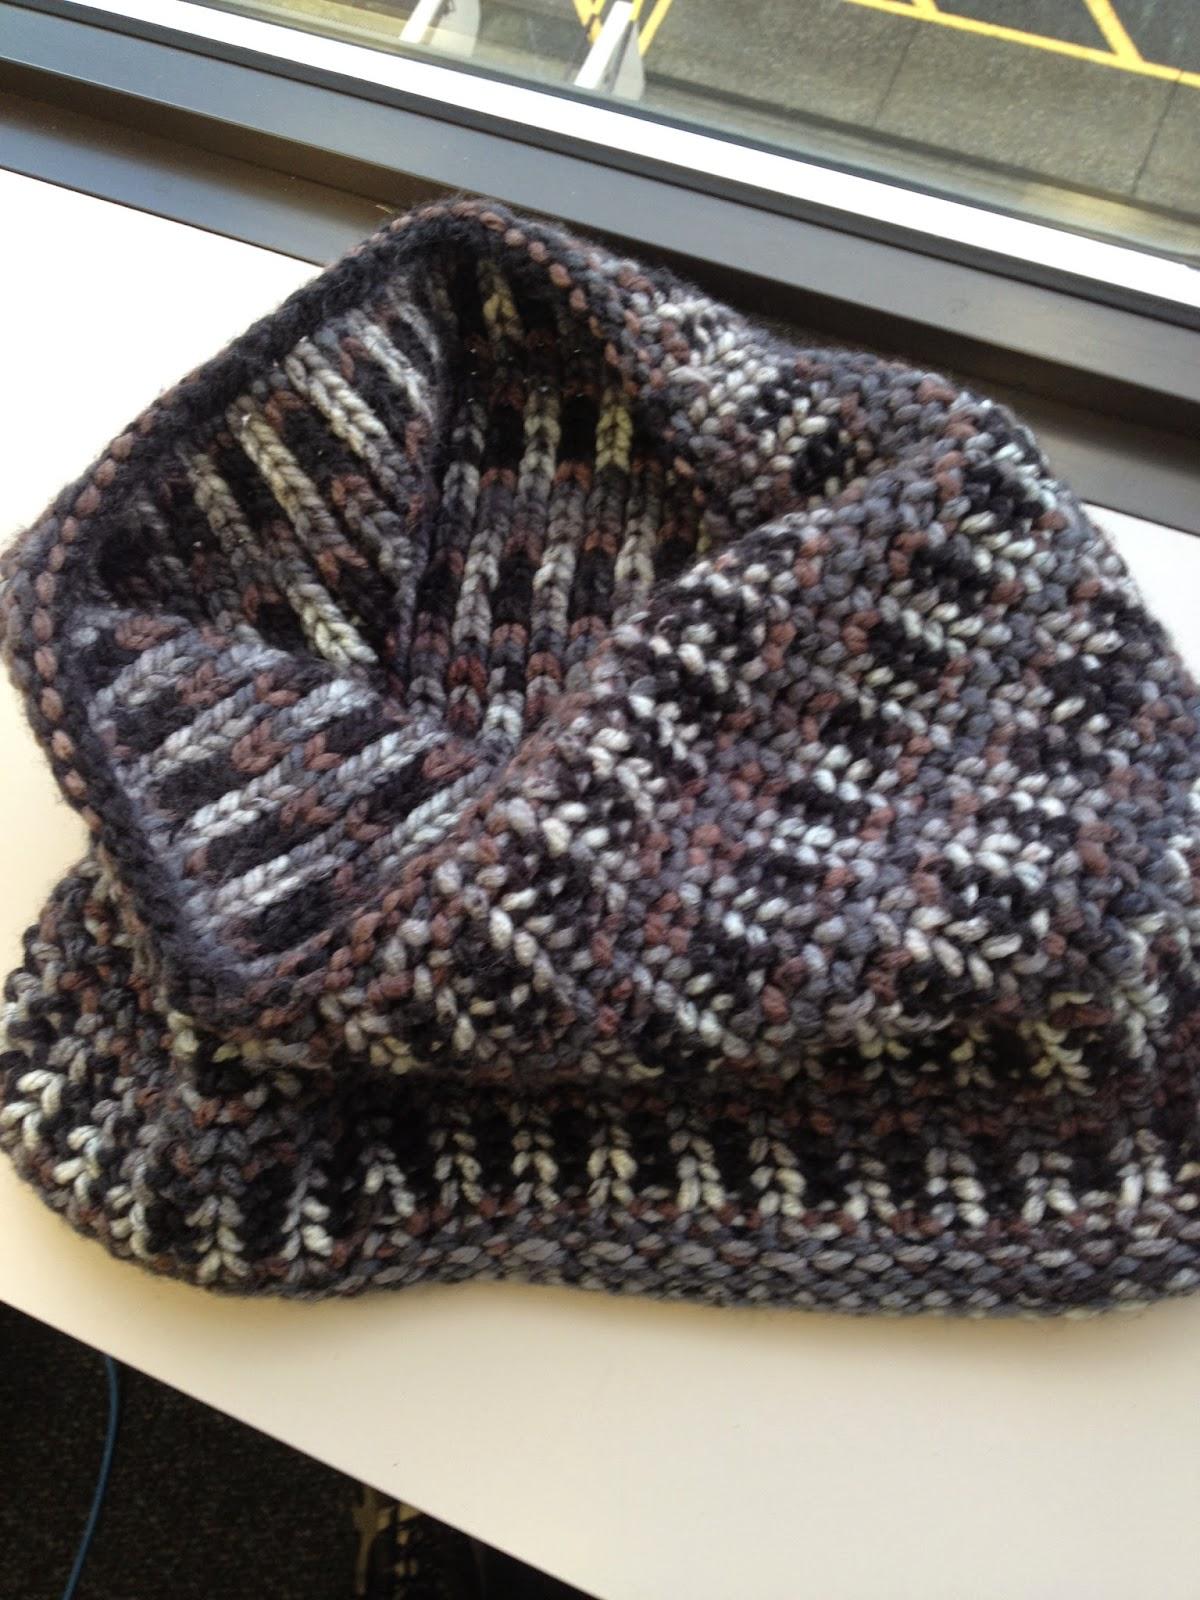 Knitting Brioche Stitch Socks 14 Easy Patterns For Tube Socks : Knit Better Socks: Brioche / Fishermans Rib